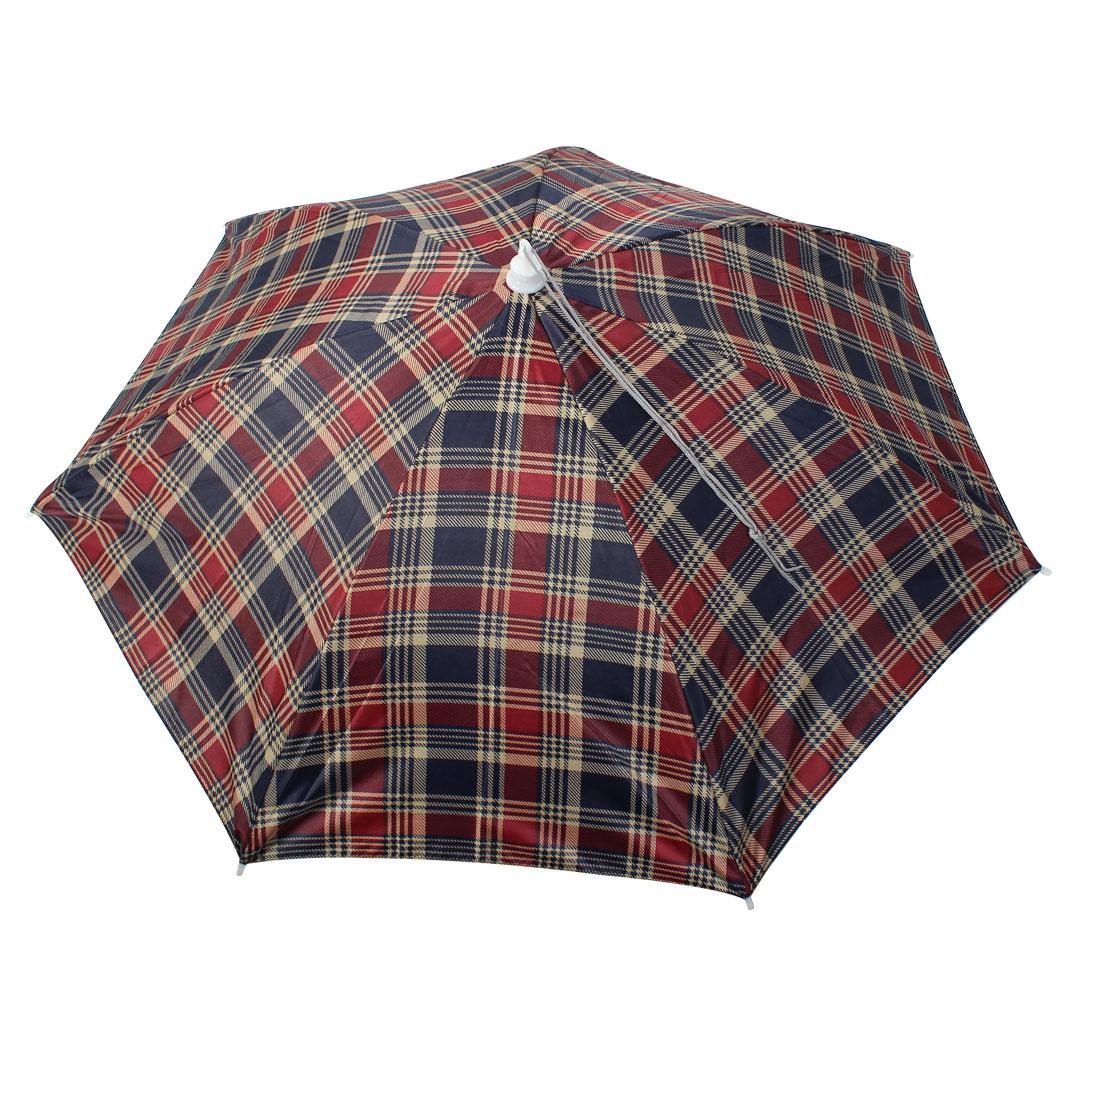 Headwear Umbrella Hat Cap Outdoor Brolly Beach Sun Rain Fishing Camping Hunting